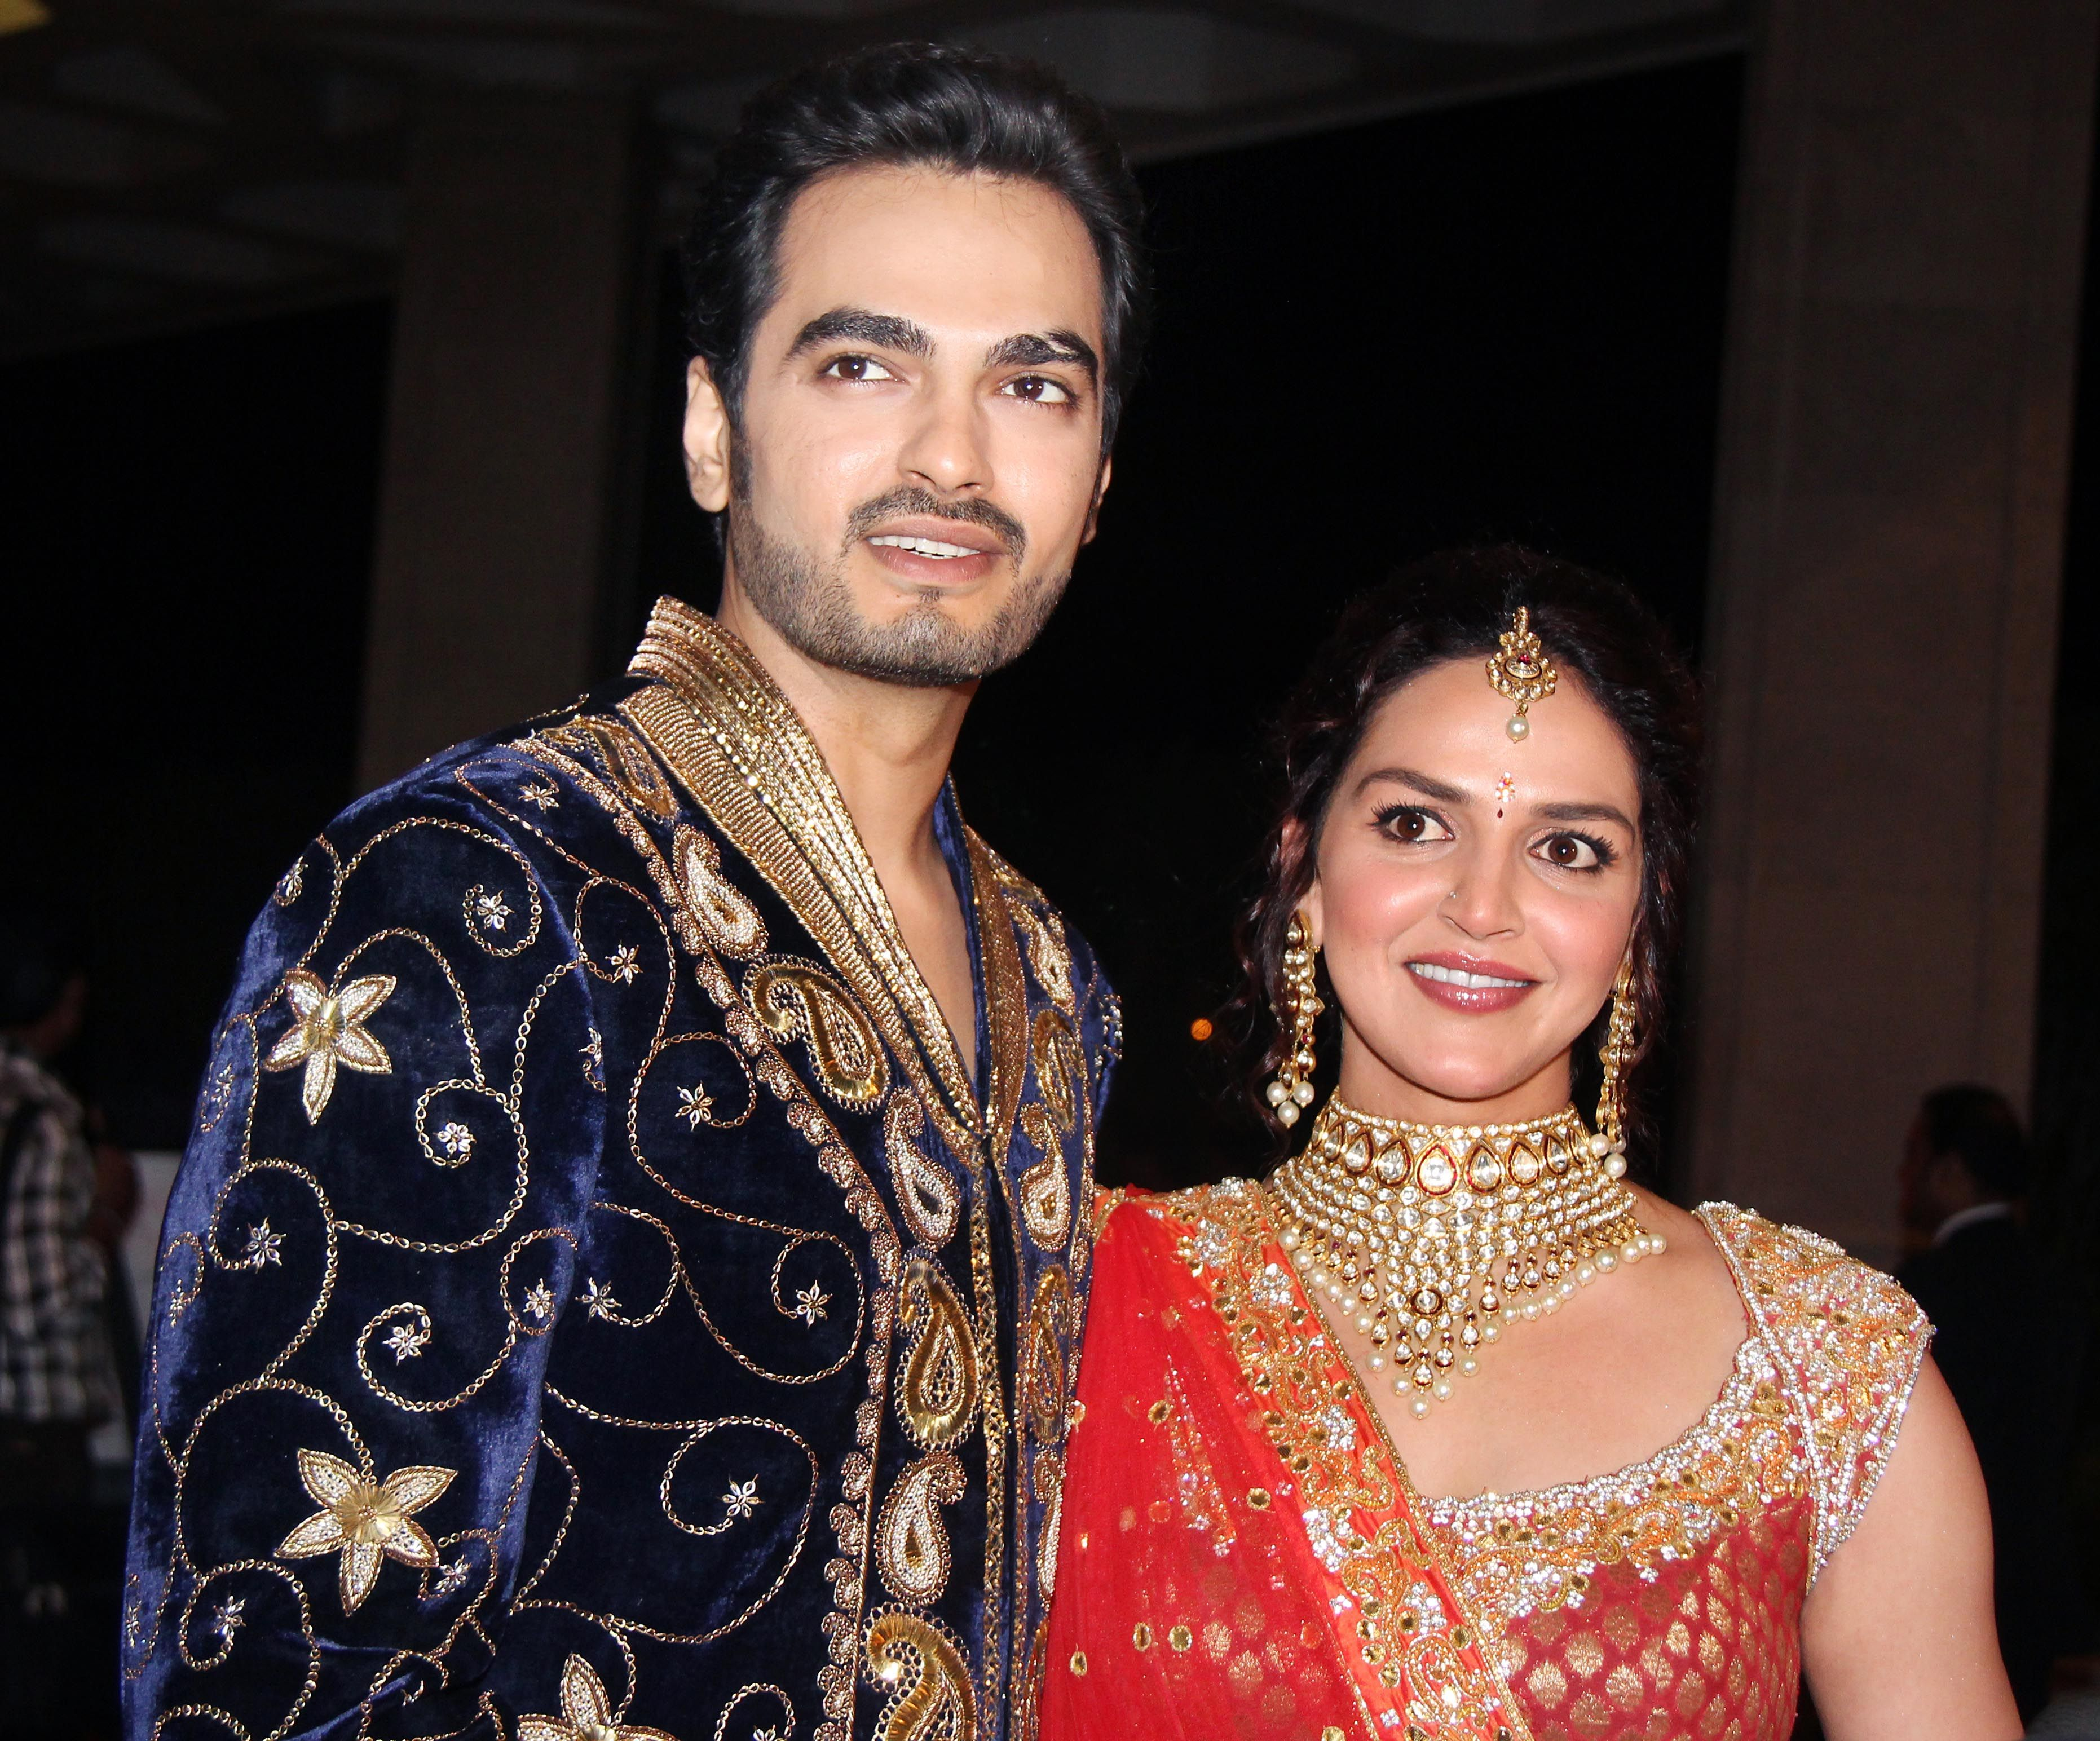 Esha Deol S Sangeet Ceremony Bharat Takhtani And Esha Deol Pre Wedding Celebration Celebrity Weddings Ceremony Style